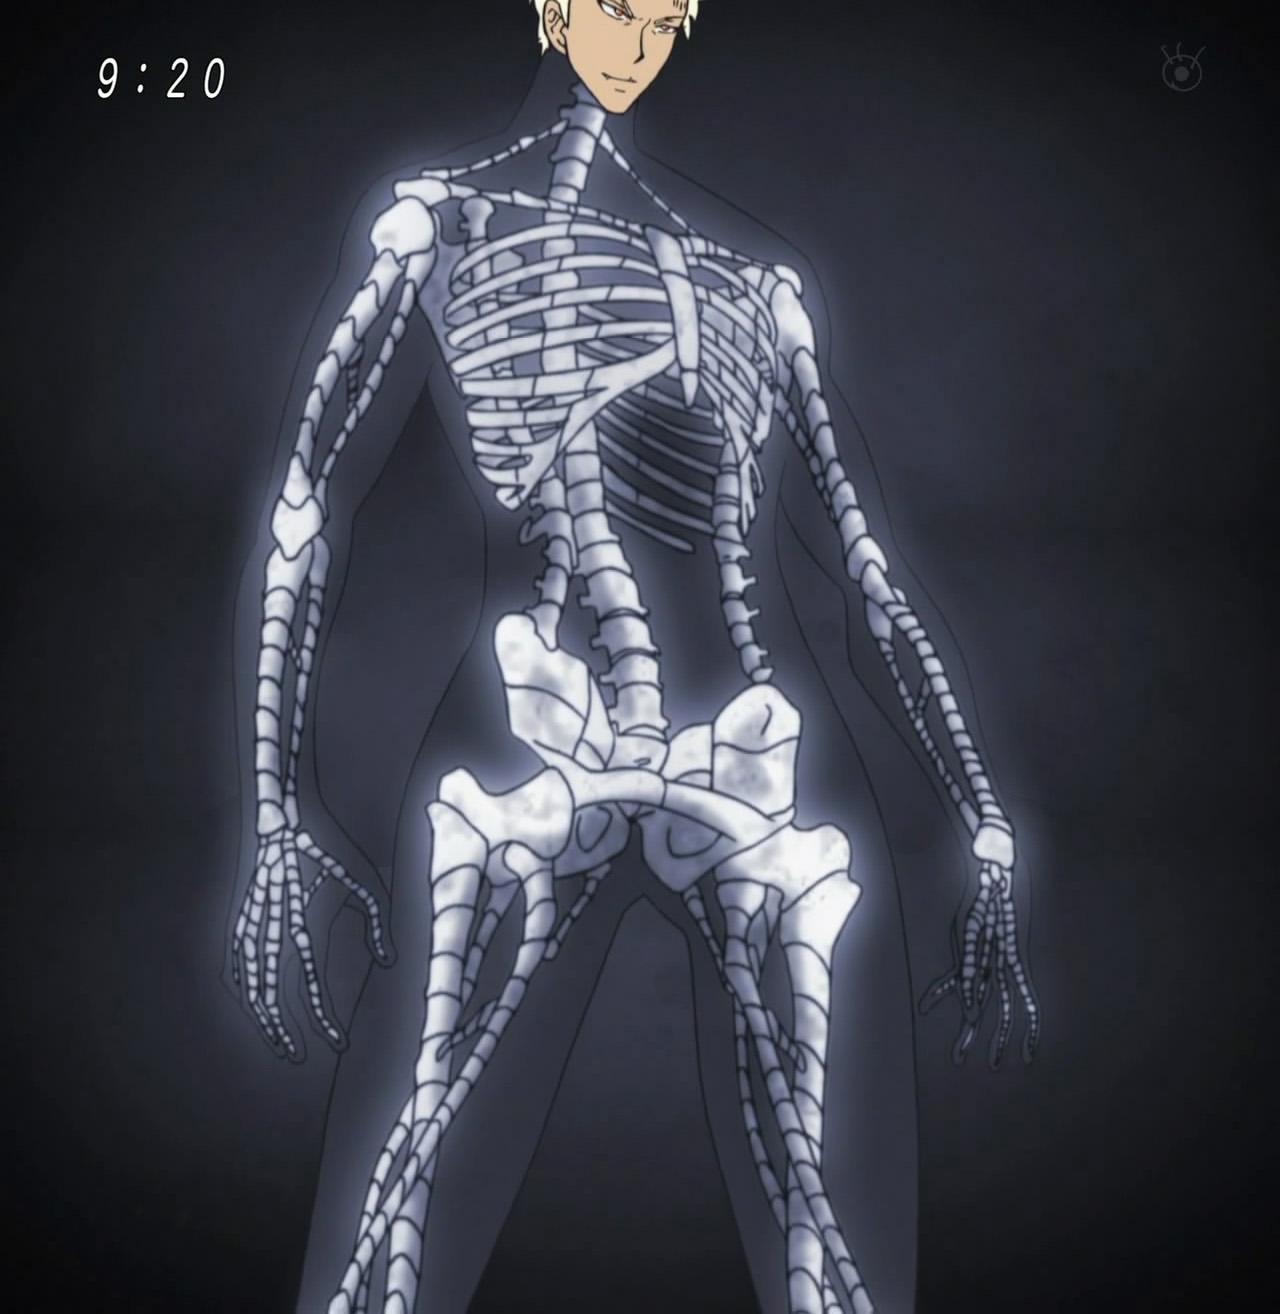 Additional Bones